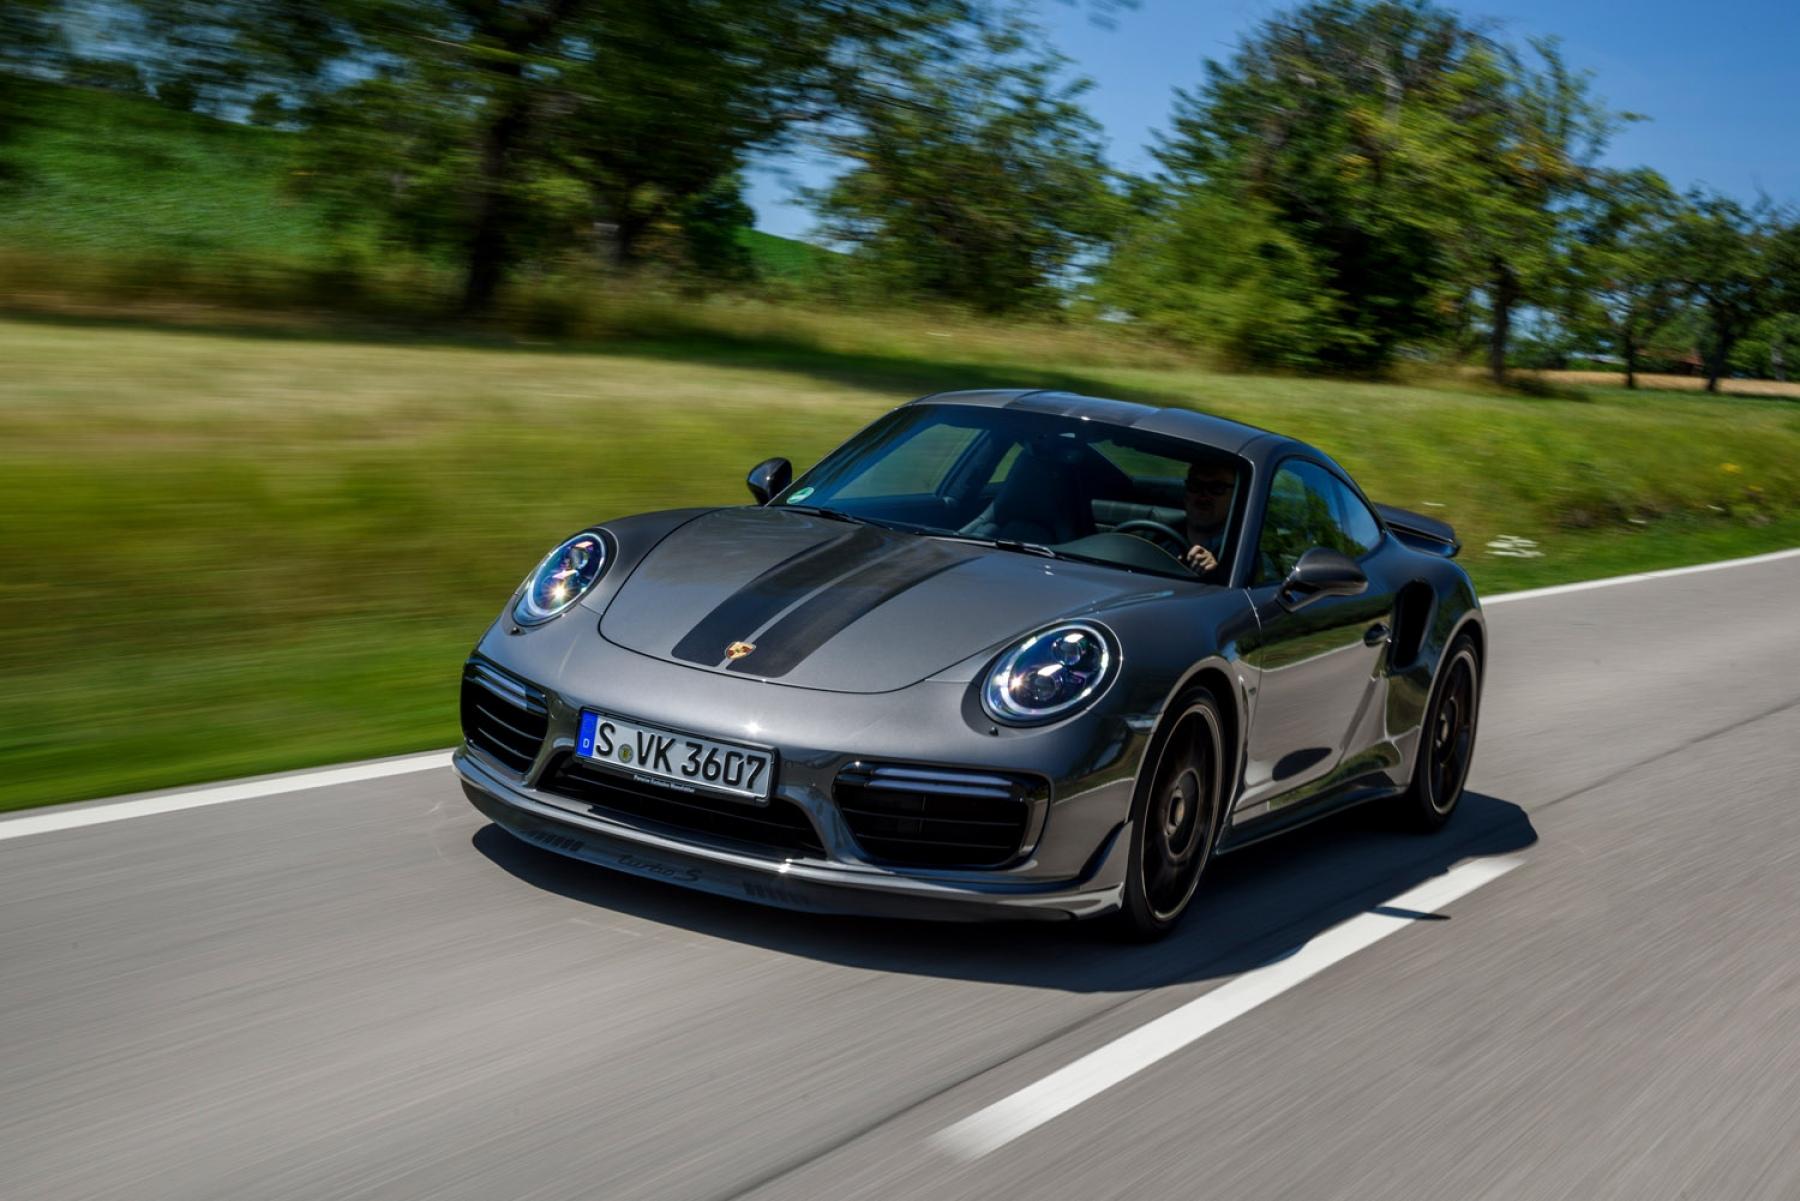 911 Turbo S Exclusive Series Agate Grey Metallic Porsche Exclusive Manufaktur Workshop